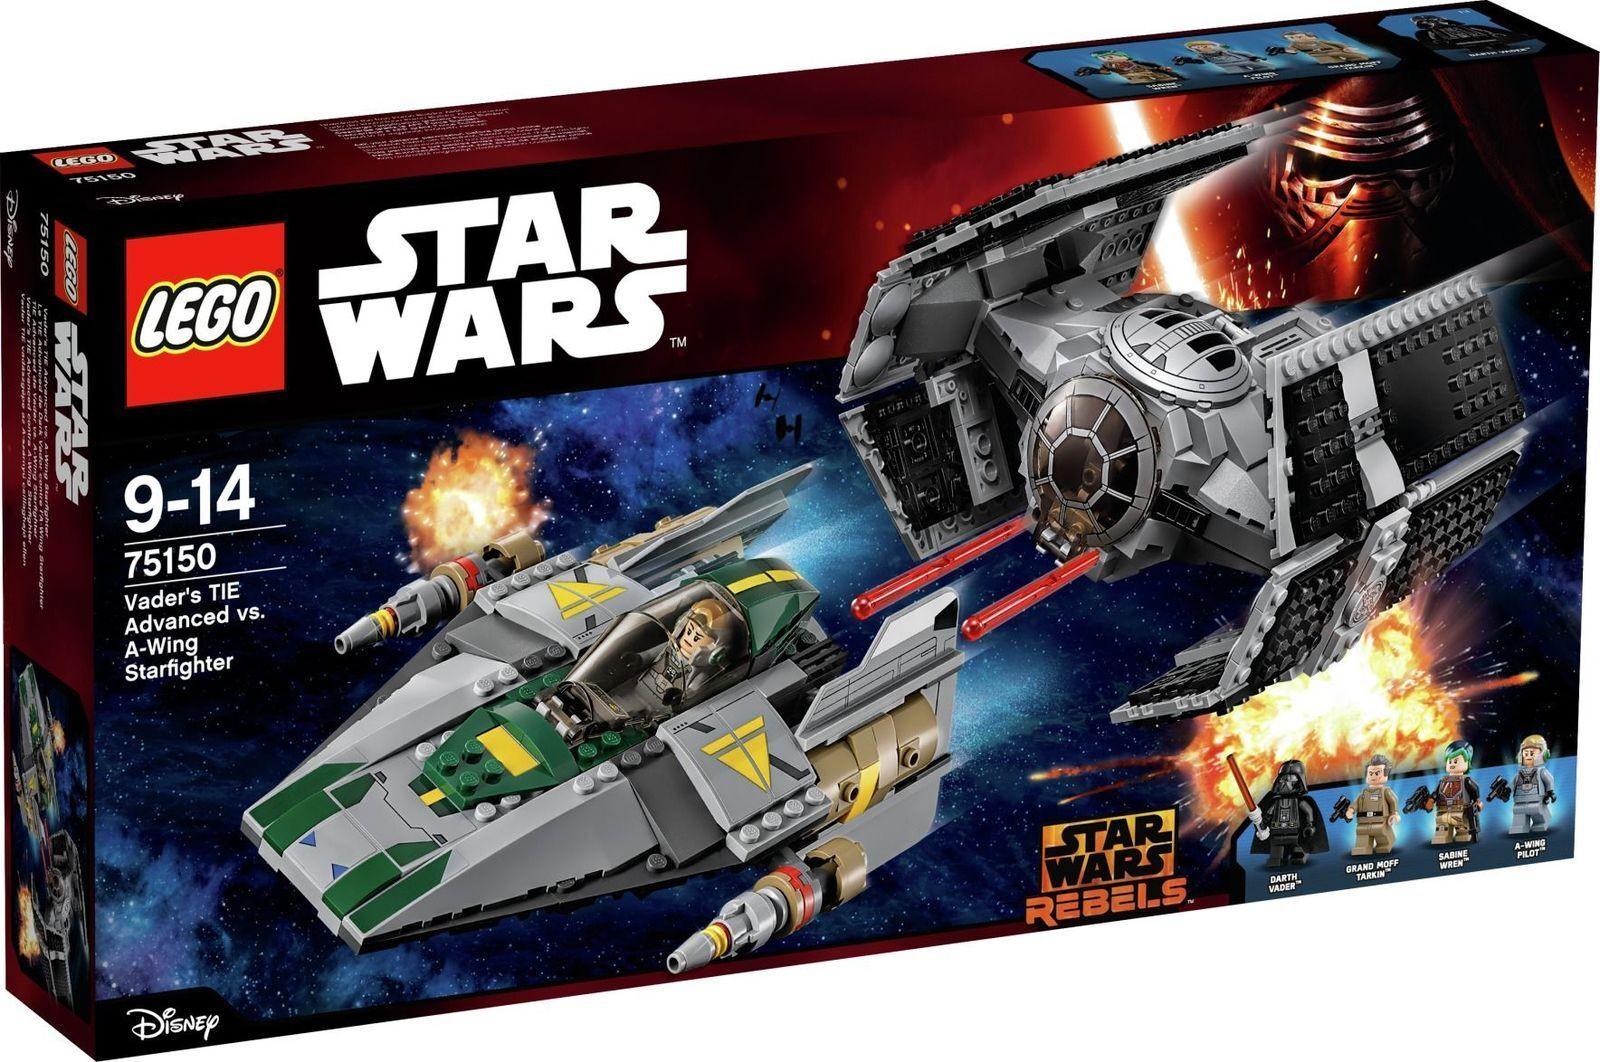 LEGO Star Wars Vader's TIE Advanced vs. A-Wing Starfighter - 75150.